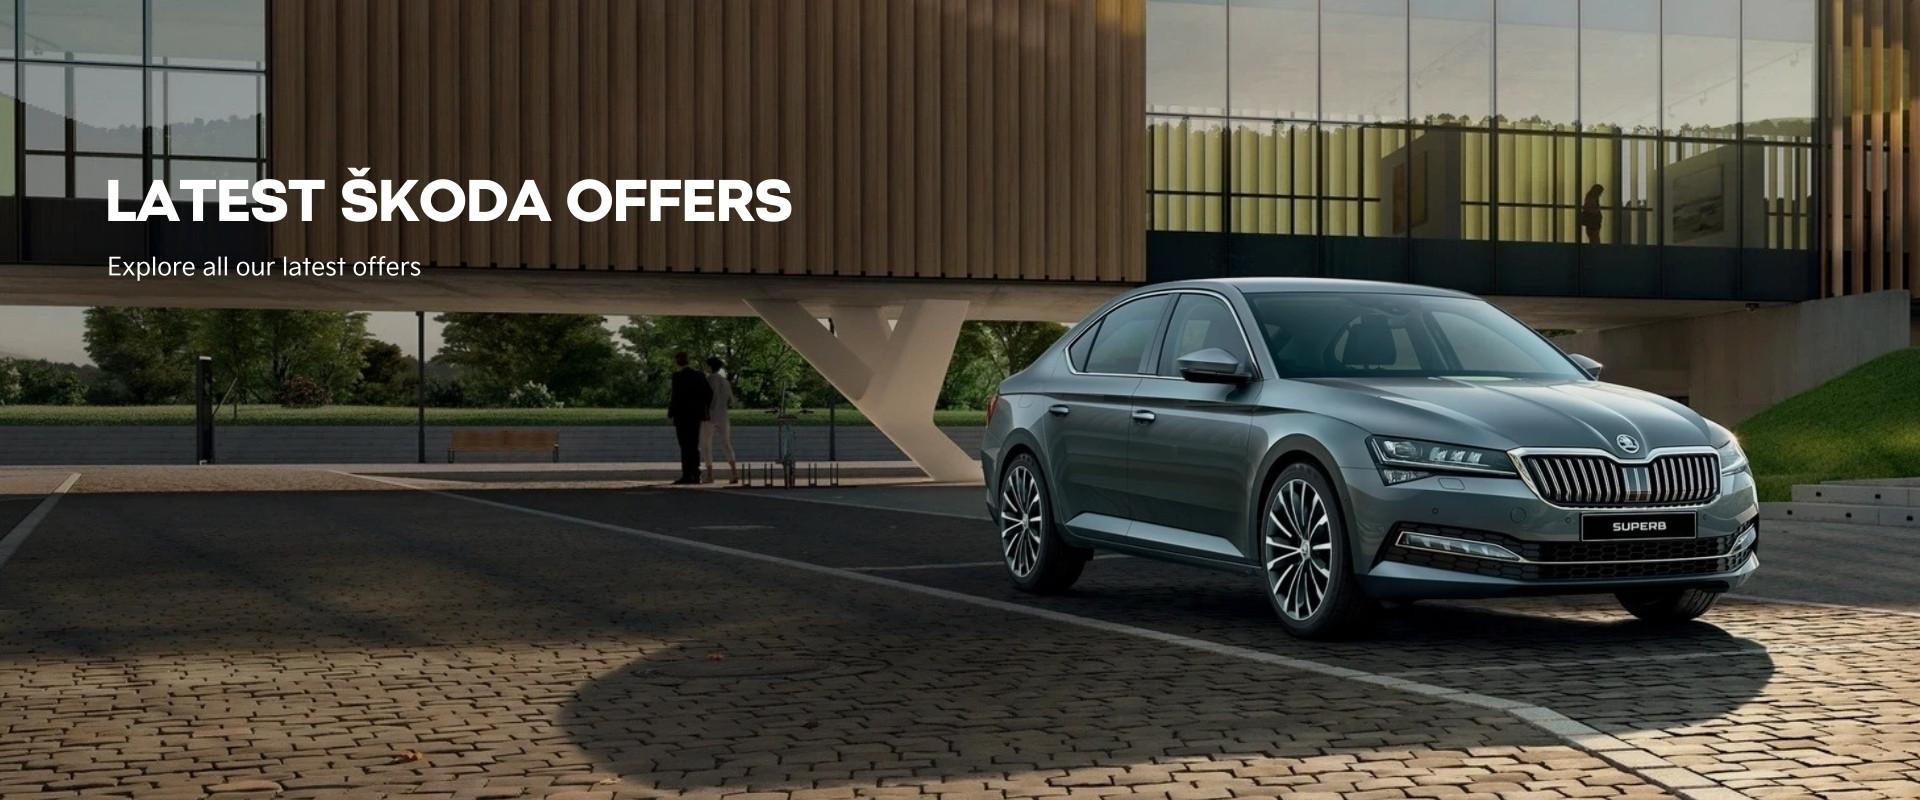 Explore all our latest Škoda Offers